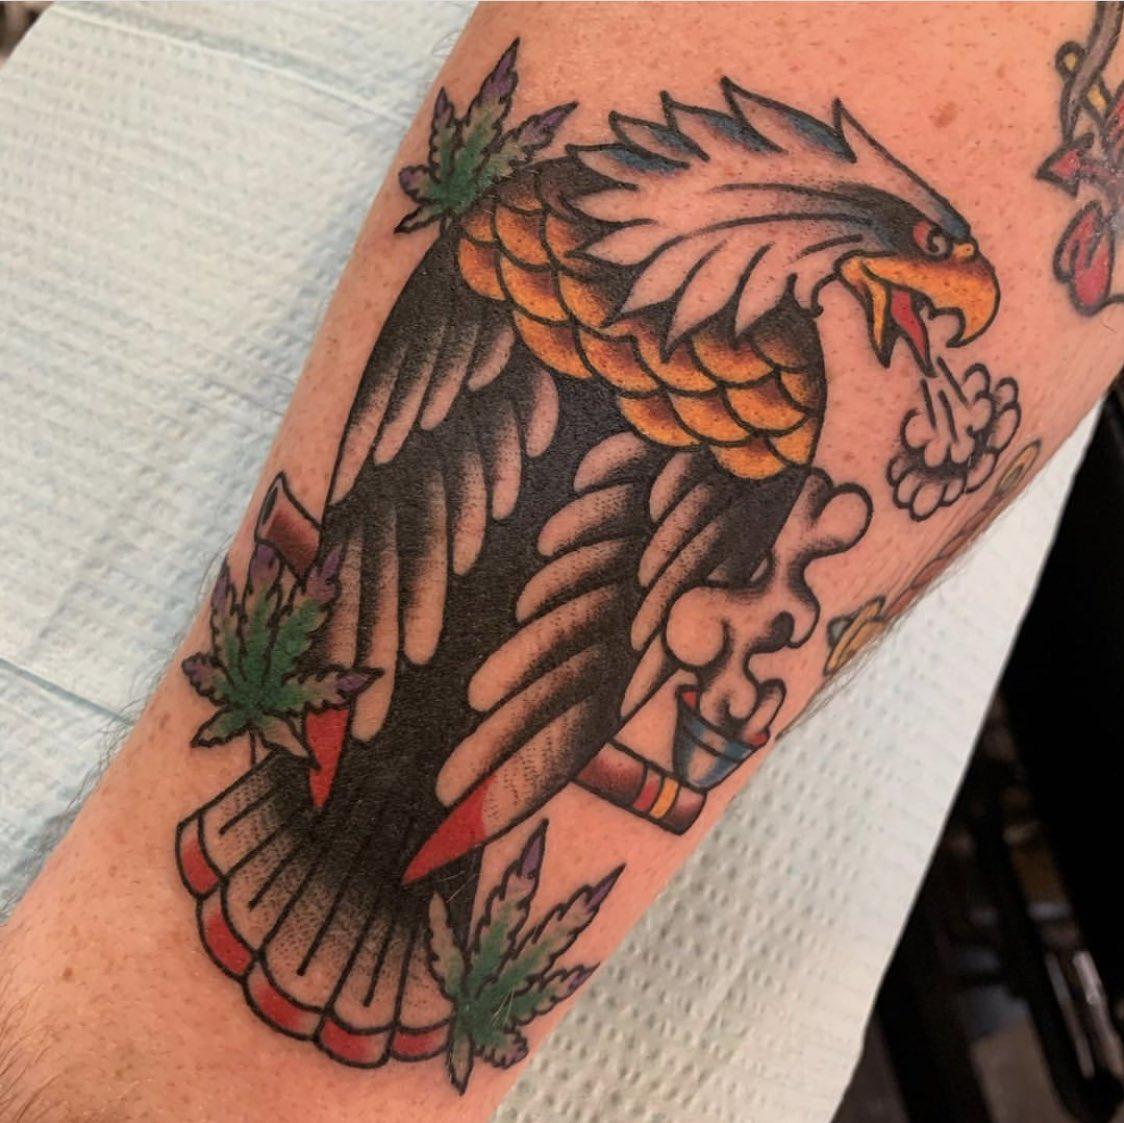 Eagle chillin' real hard by @cs_tattoo #kustomhustletattoo #traditionaltattoo #eagletattoo #oldlines #boldwillhold #weedtattoo #tradworkerssubmission #scadsavannah #savannahtattooshoppic.twitter.com/LIfG5jR405